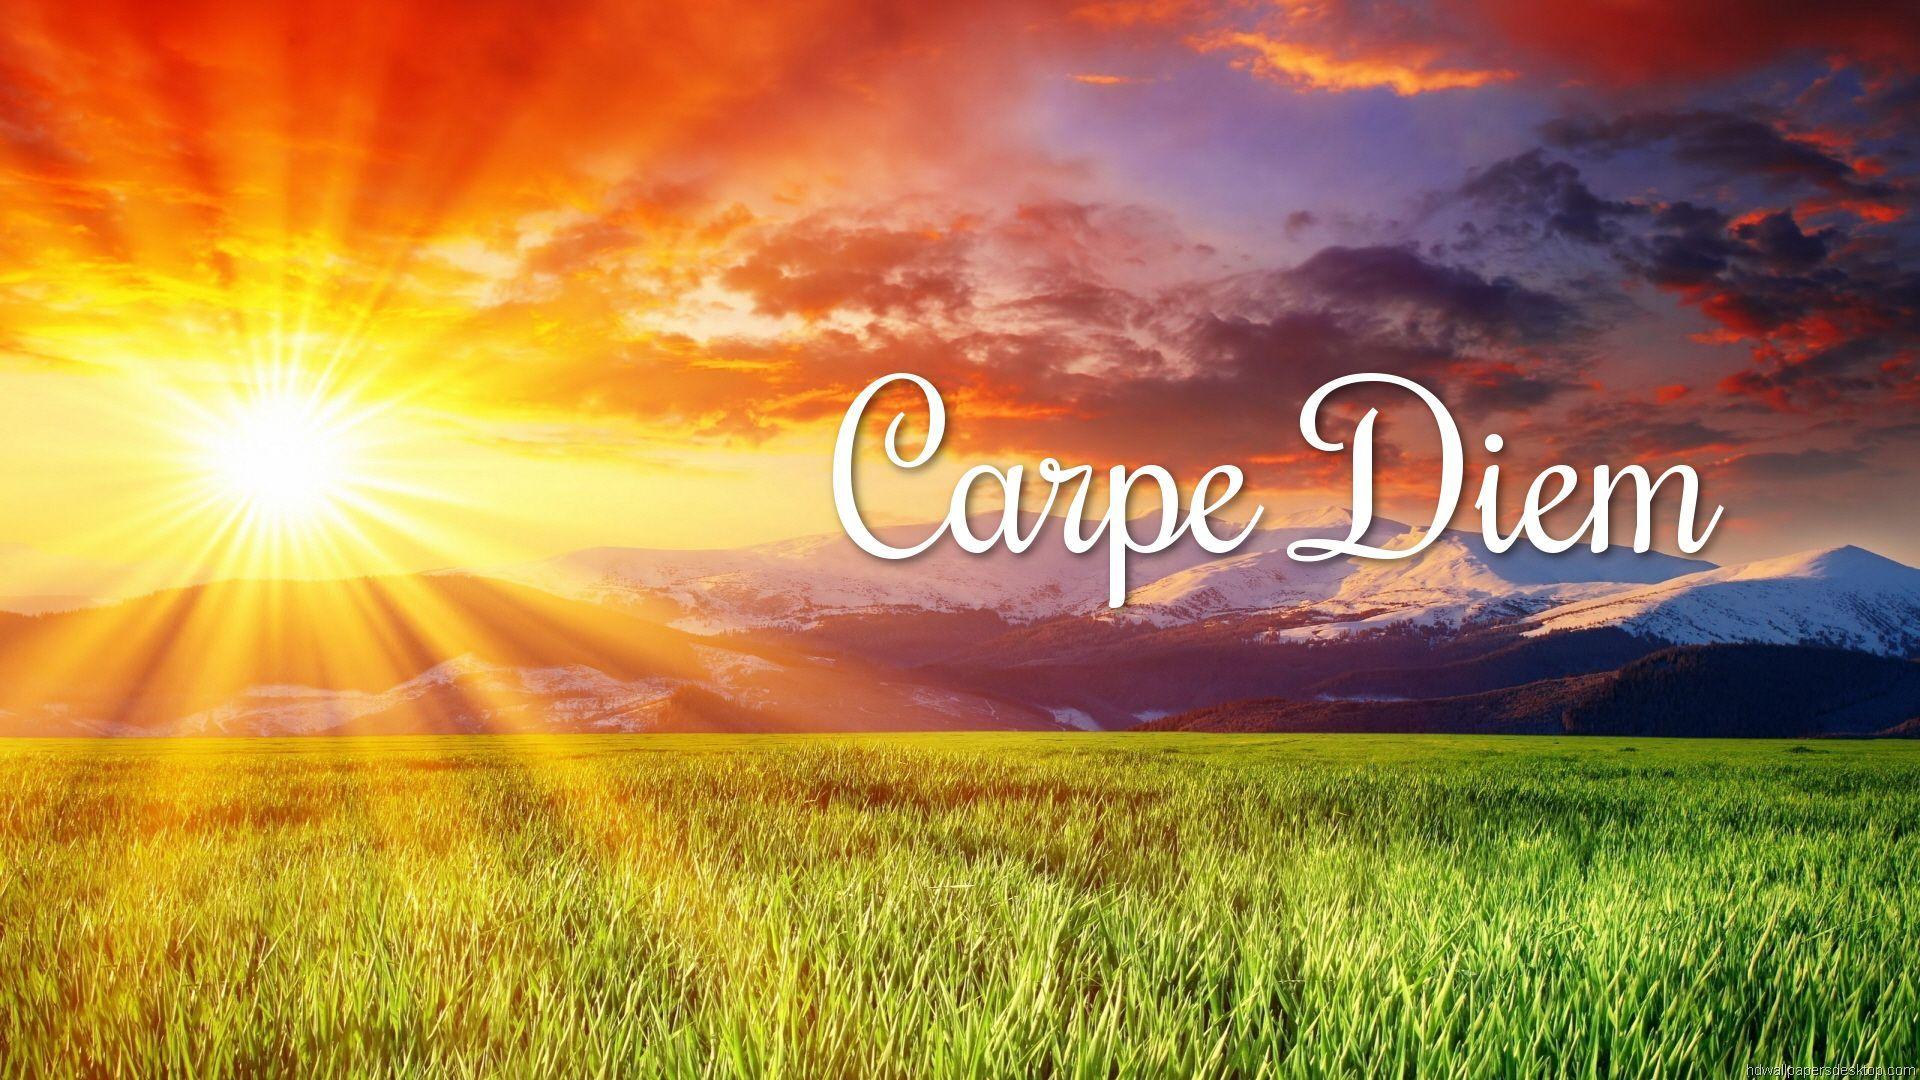 Carpe Diem laptop background wallpaper